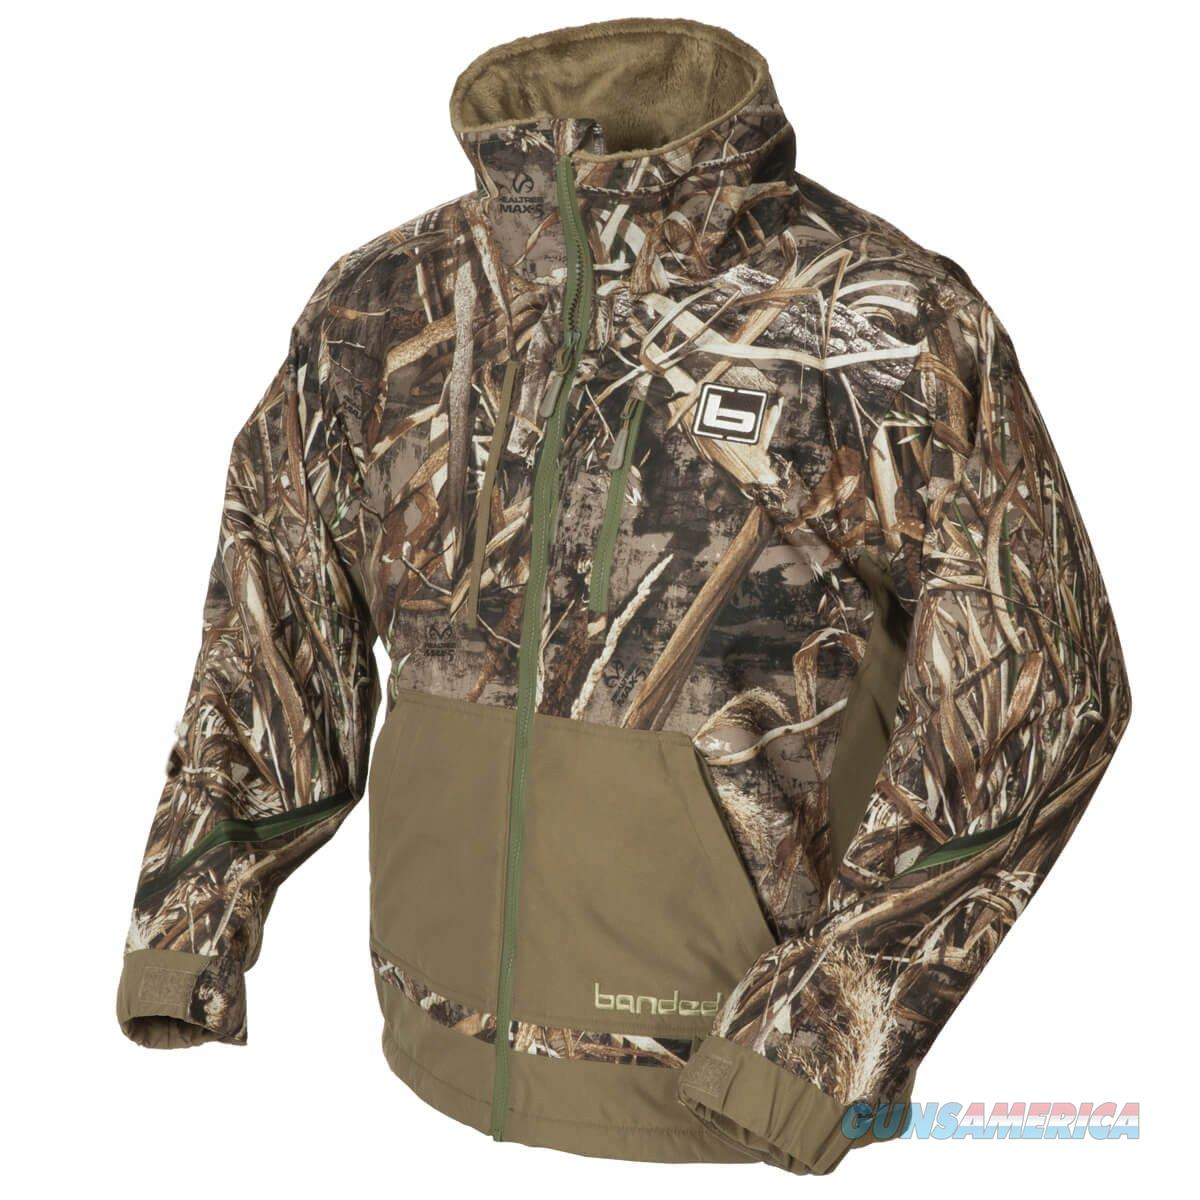 Banded Chesapeake Pullover Max 5 MD  Non-Guns > Shotgun Sports > Vests/Jackets